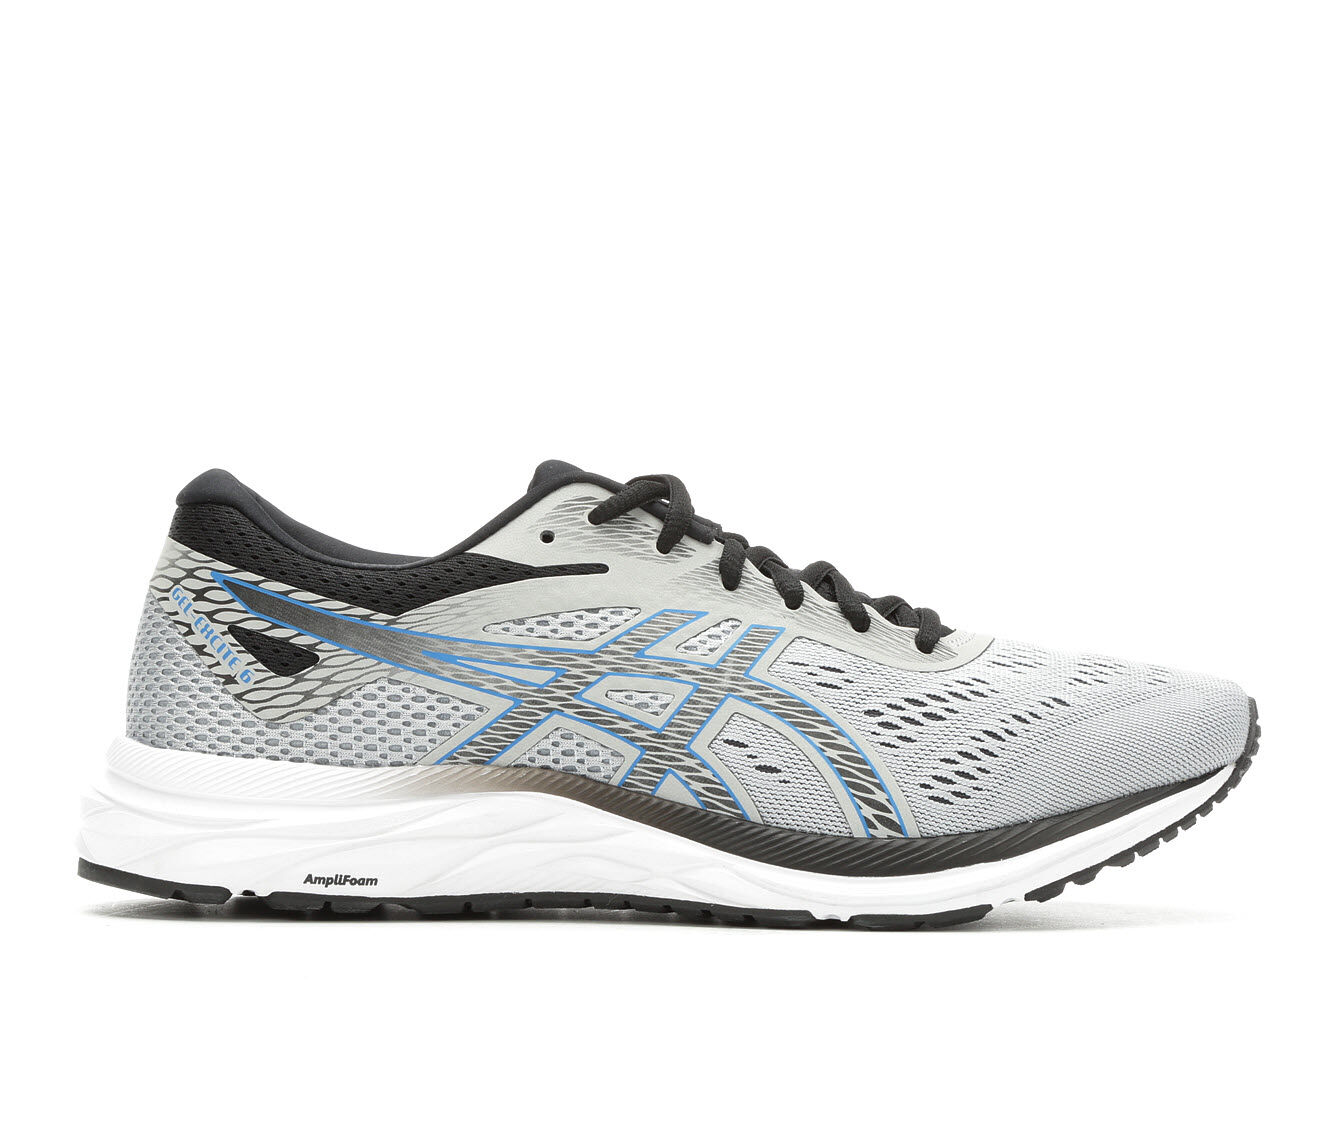 Men's ASICS Gel Excite 6 Running Shoes